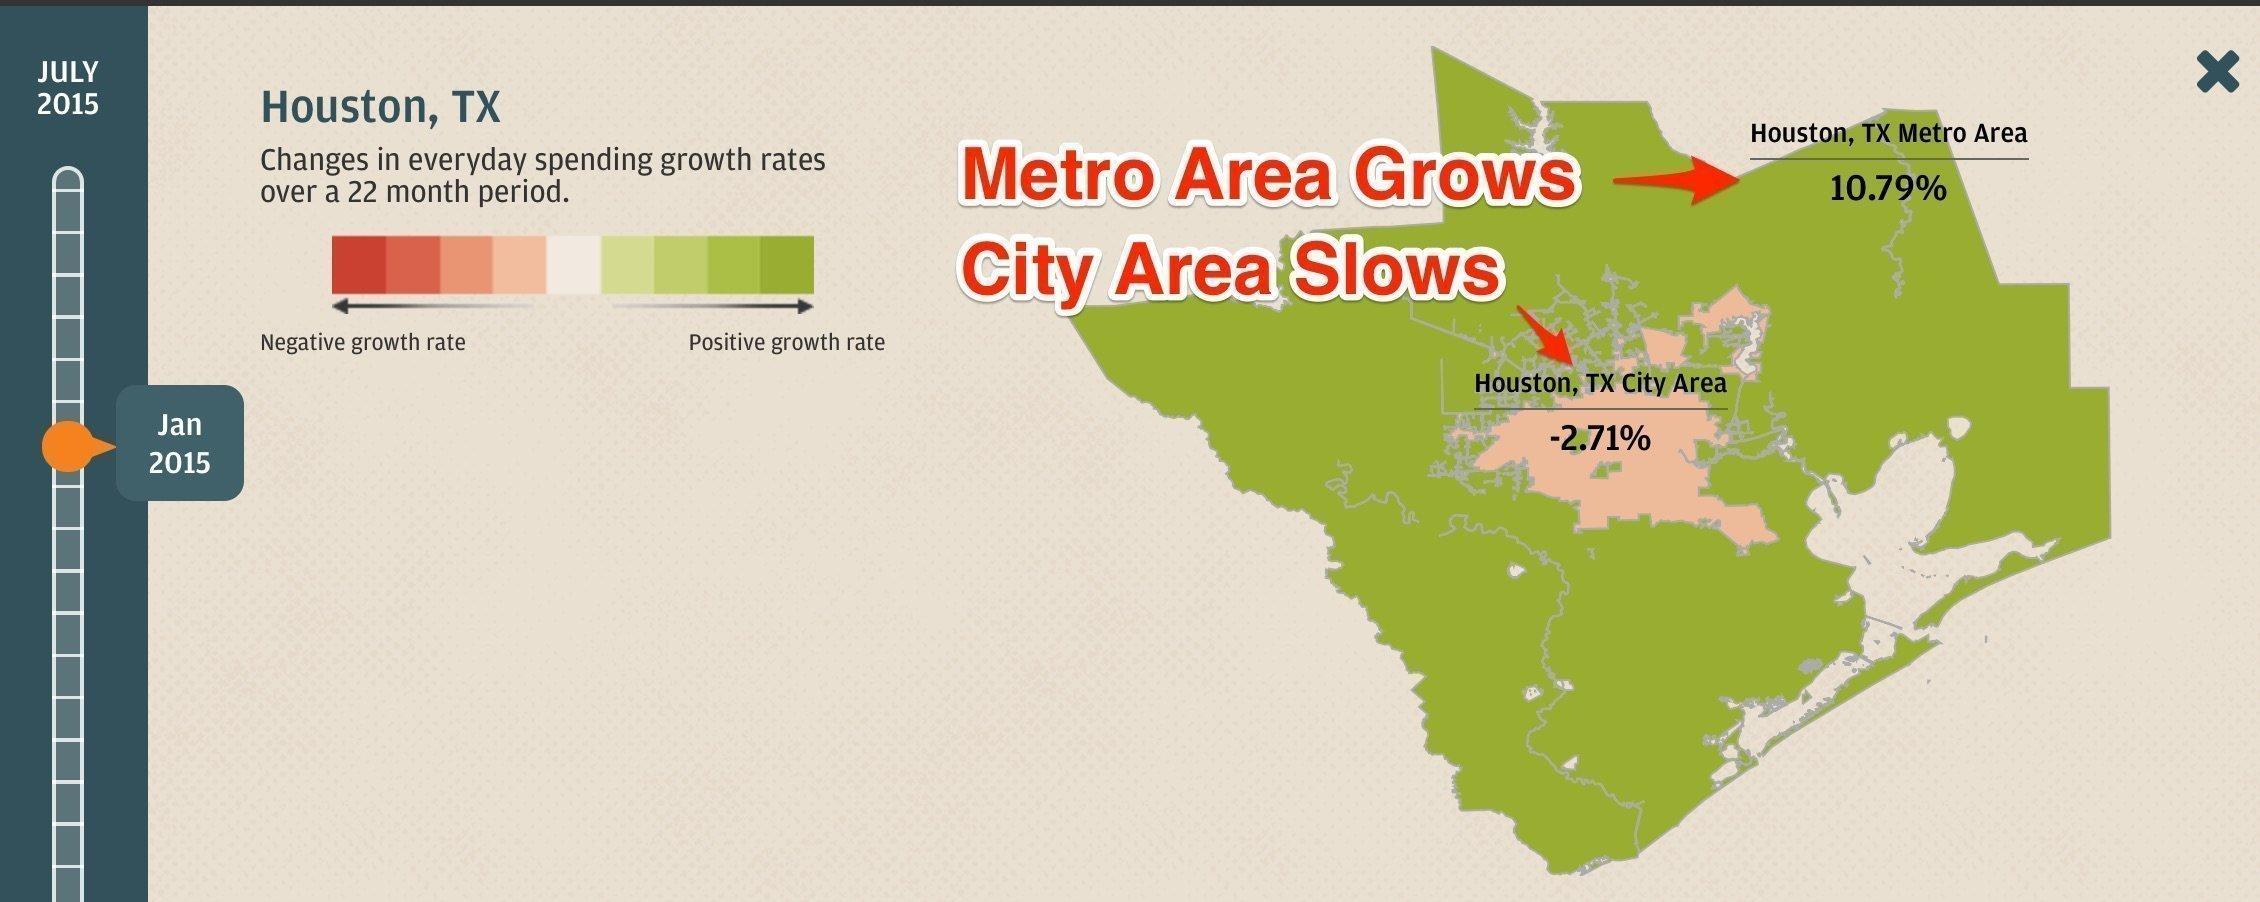 Houston Economy Spending Growth, January 2015